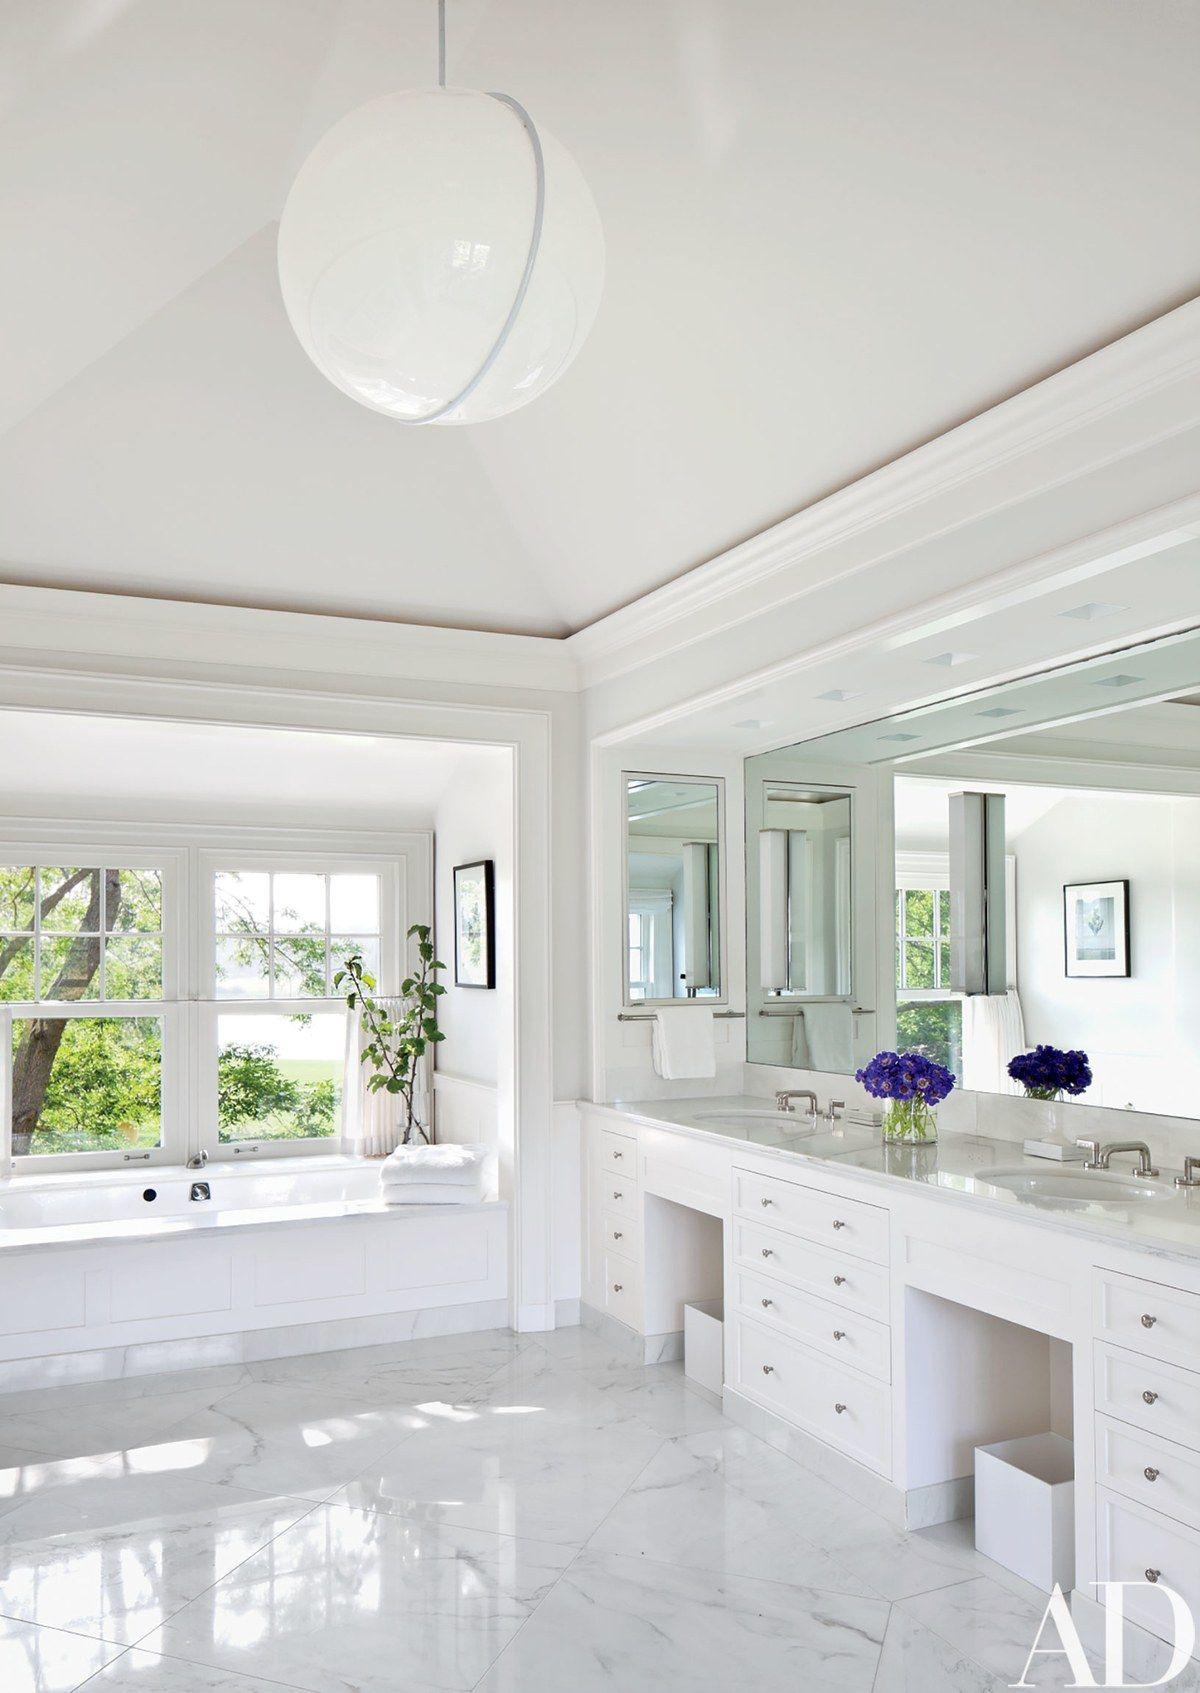 The adjoining marblefloored bath includes an acrylic pendant light